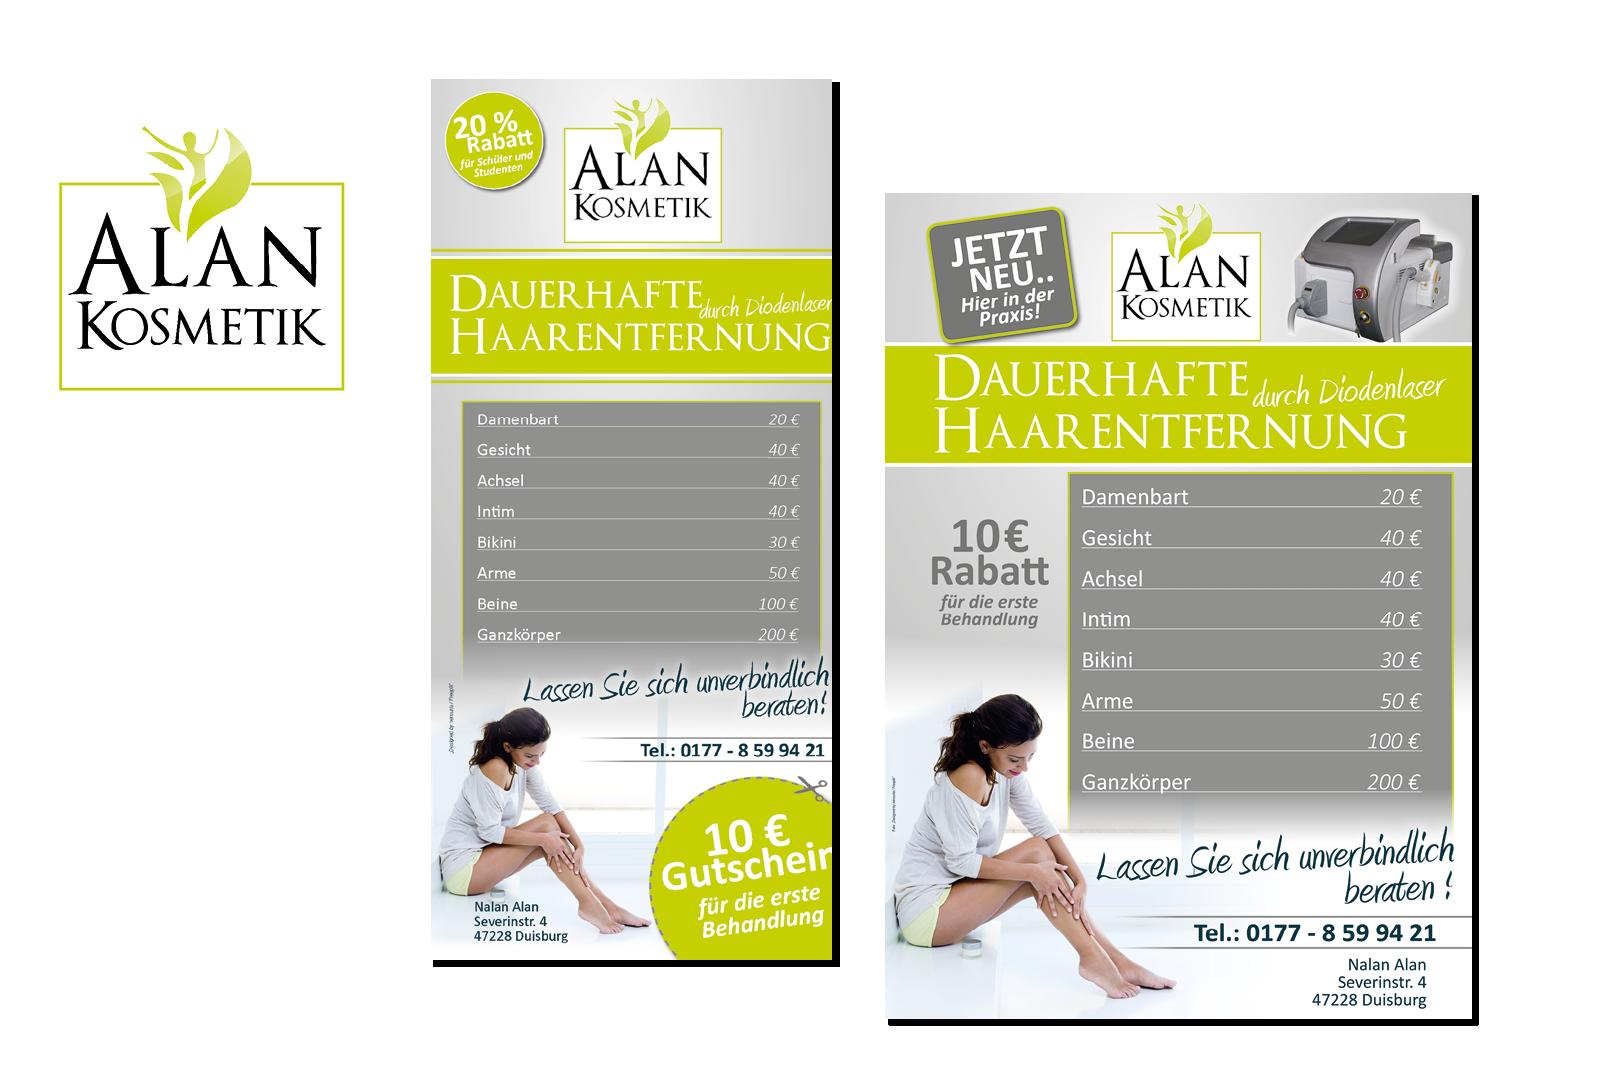 Dauerhafte Haarentfernung Logo Flyer und Plakat